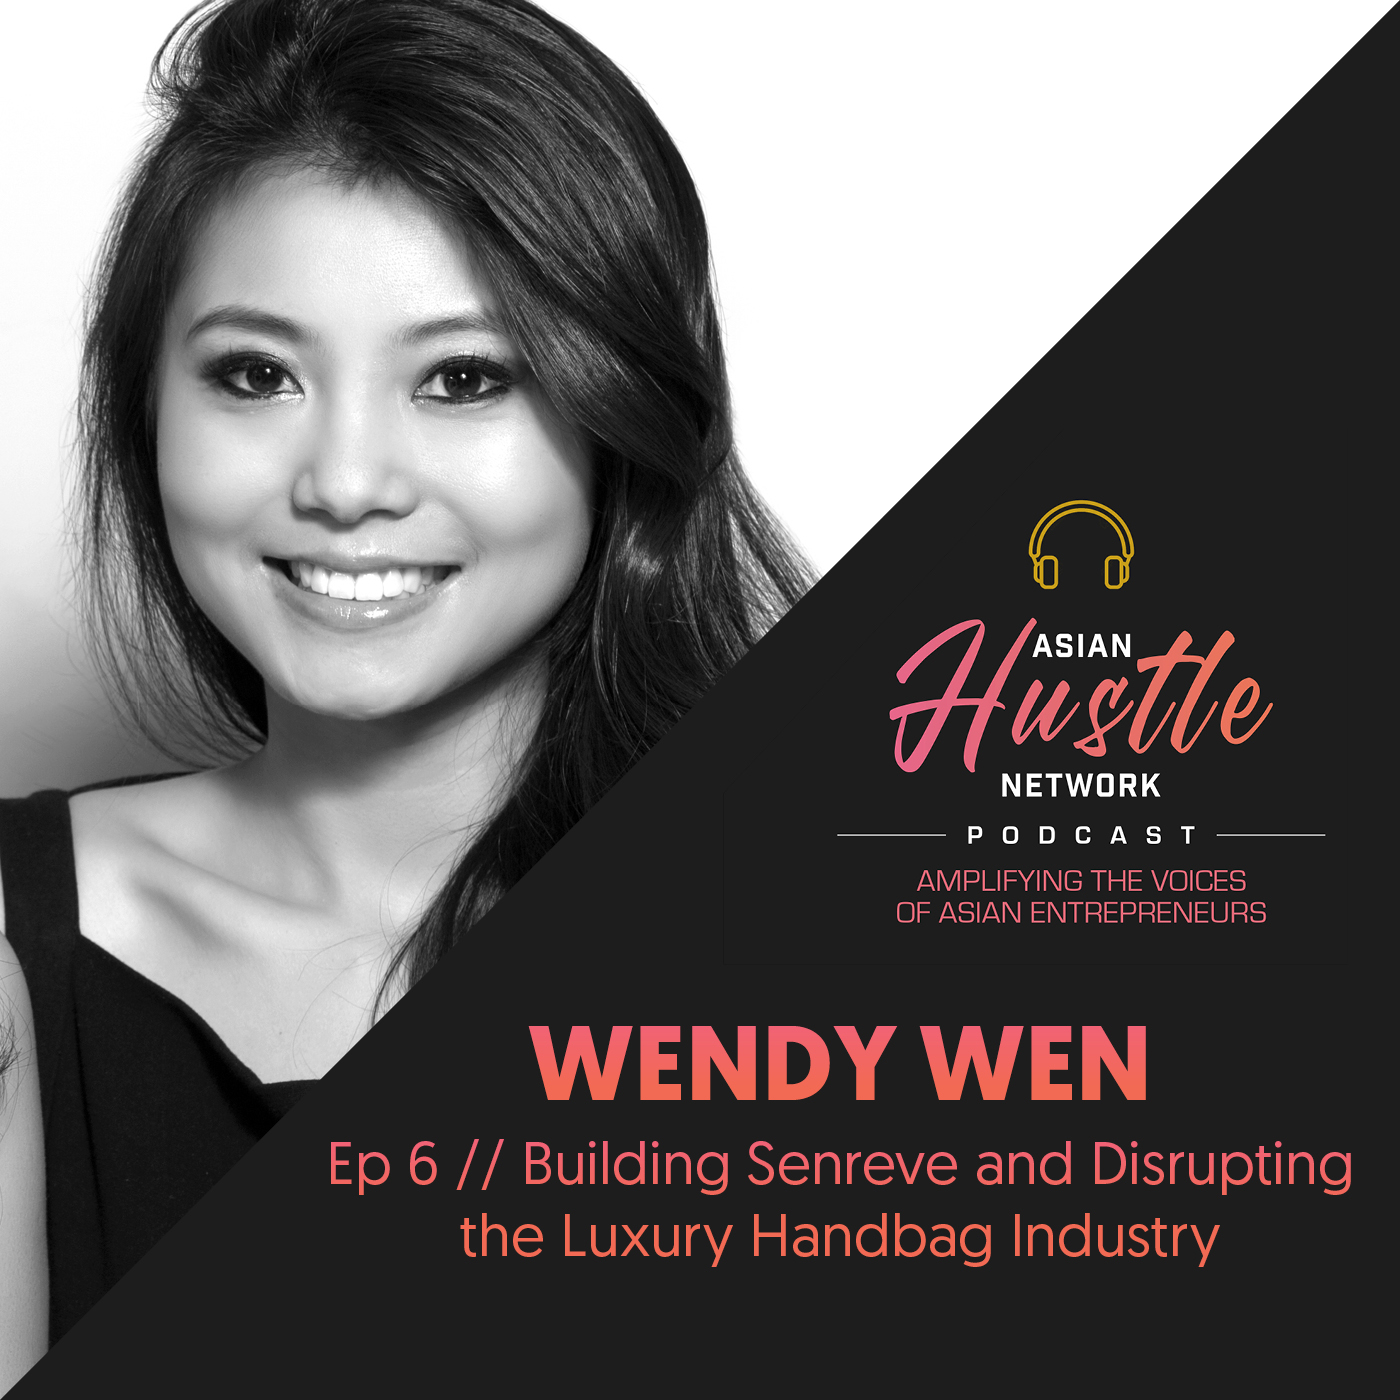 www.asianhustlenetwork.com: Wendy Wen // Ep 6 // Building Senreve and Disrupting the Luxury Handbag Industry